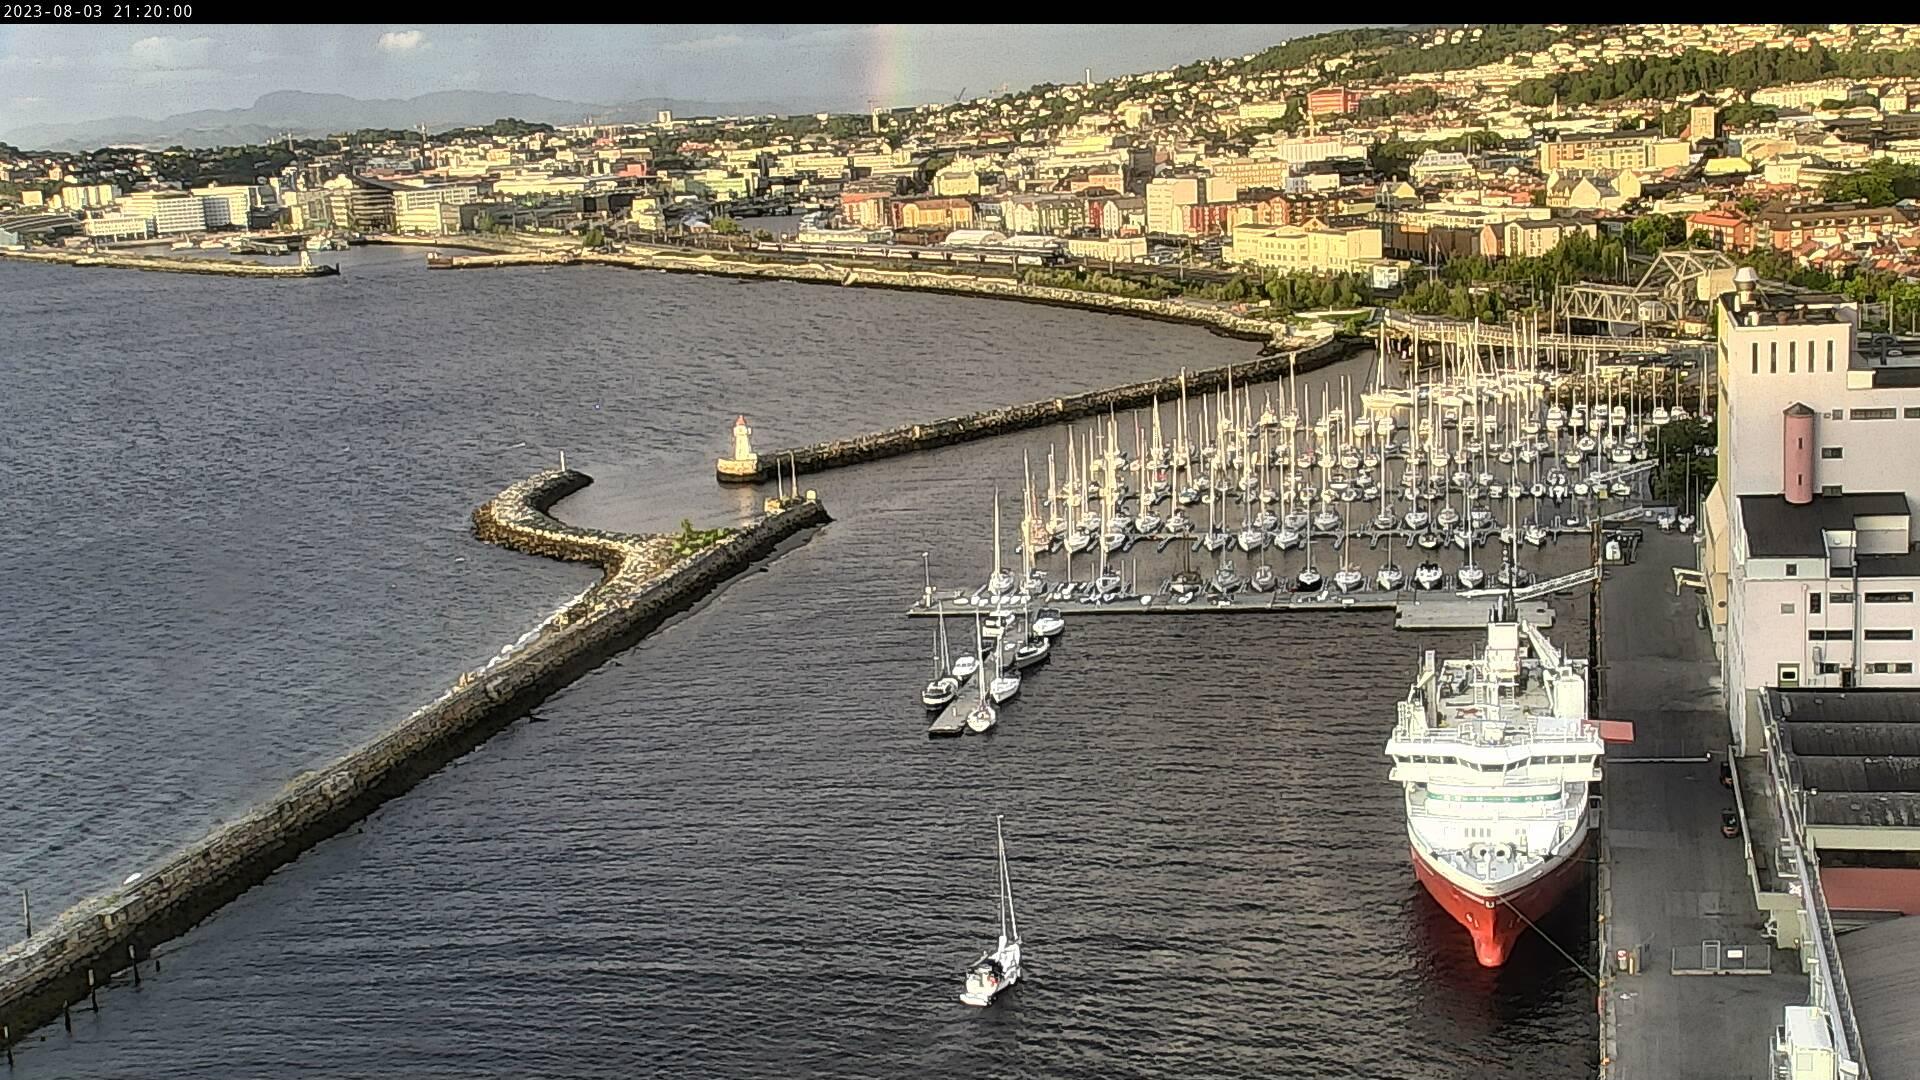 Trondheim - havn; Skansen småbåthavn